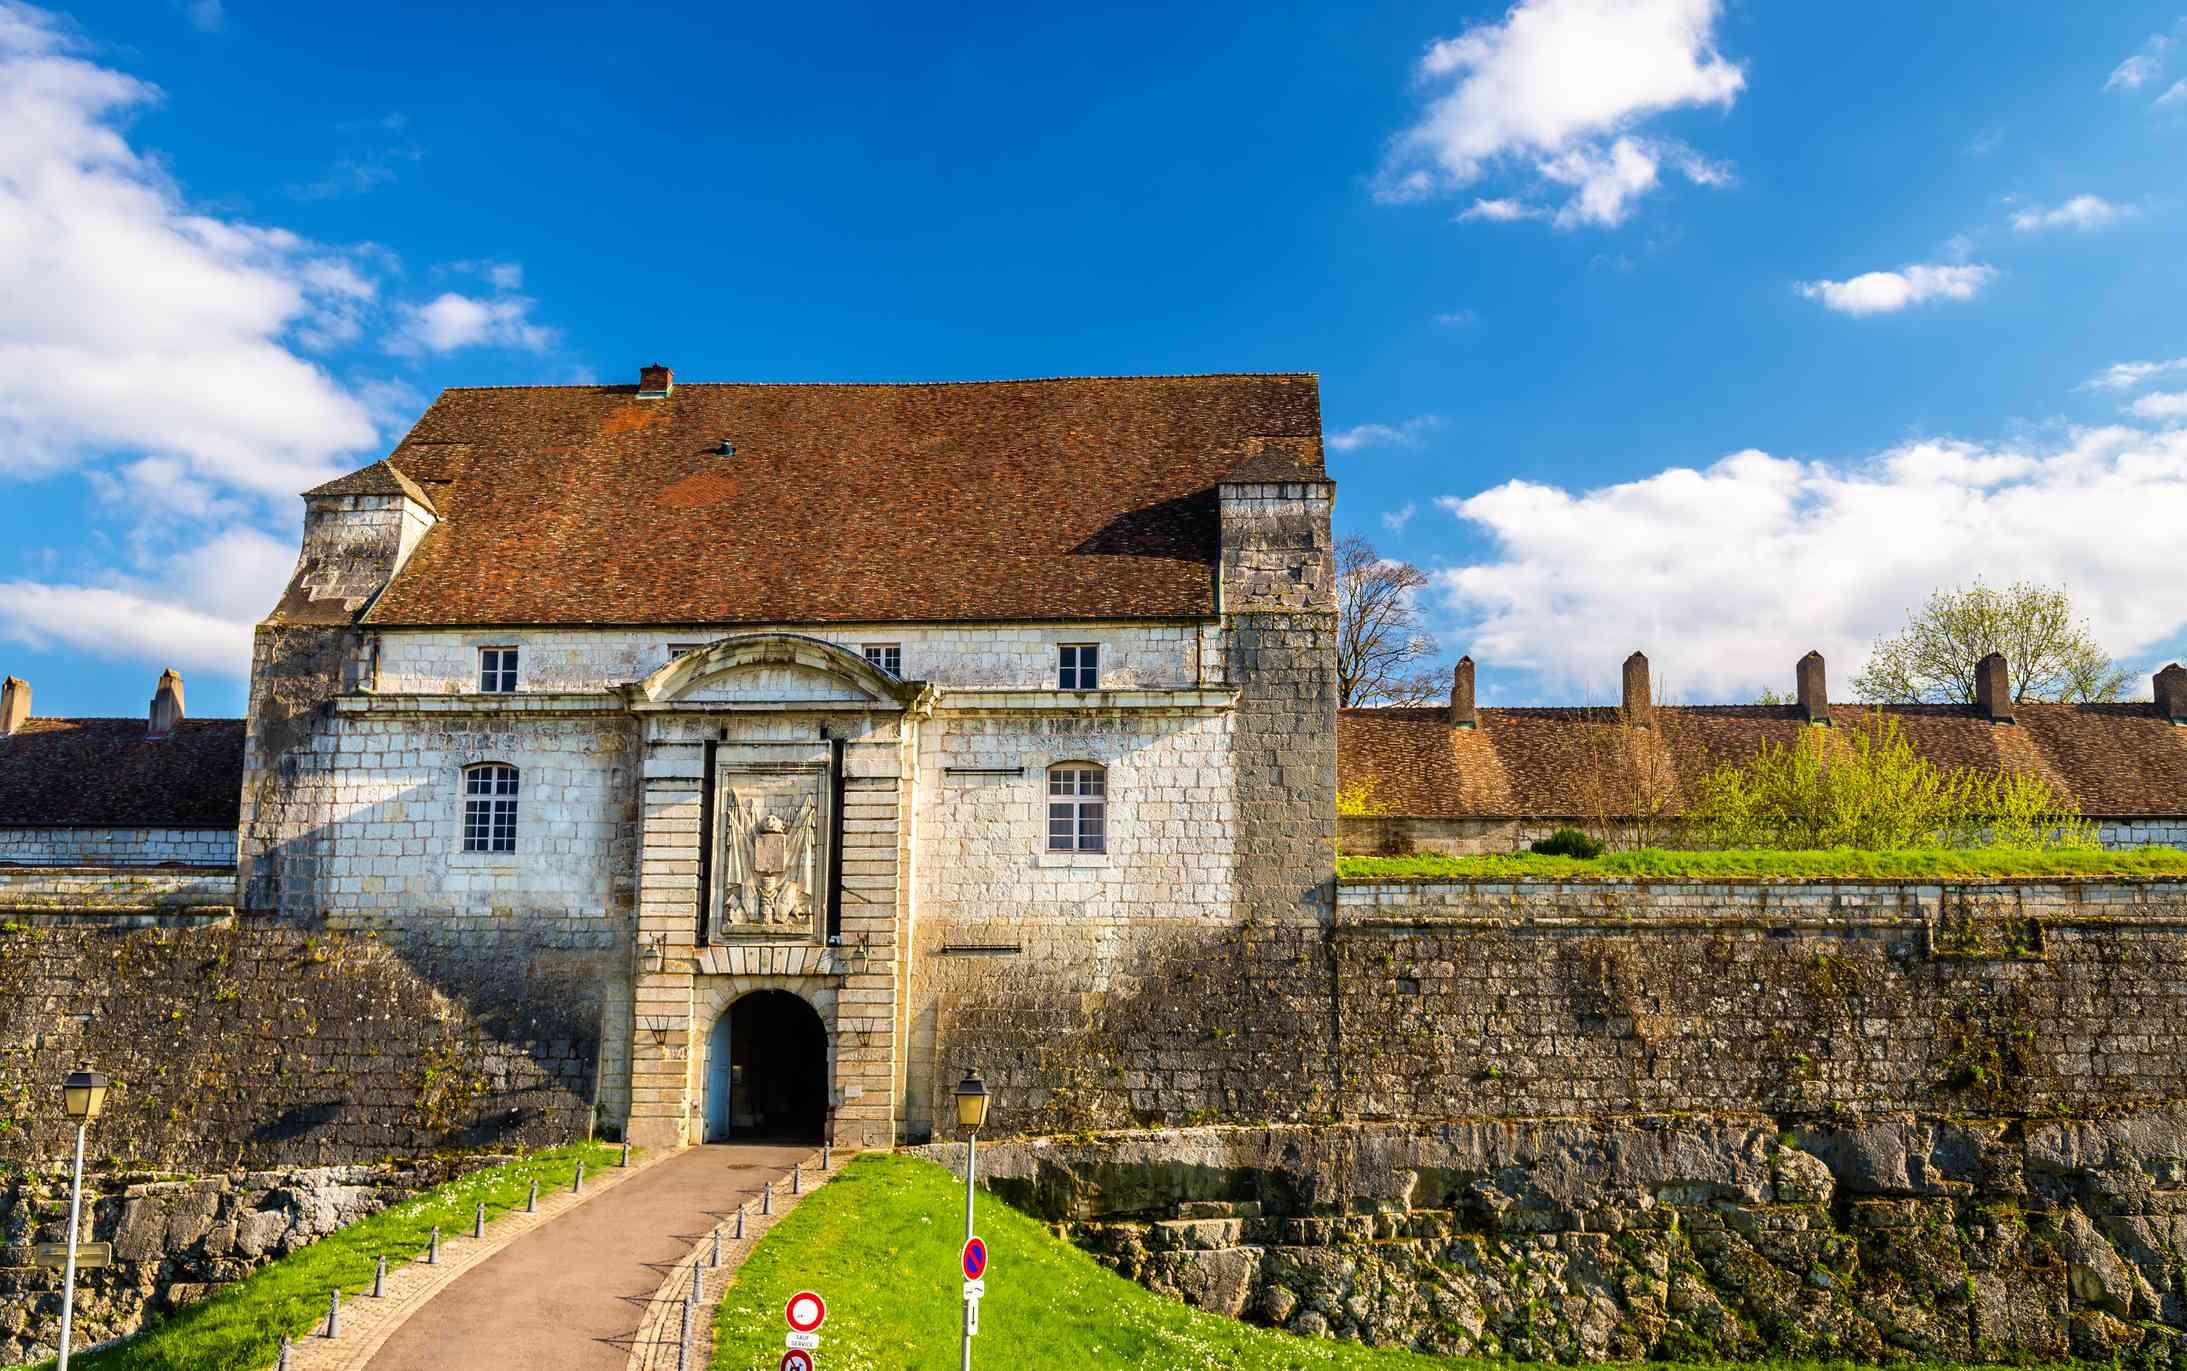 Entrance gate of the Citadel of Besancon - France